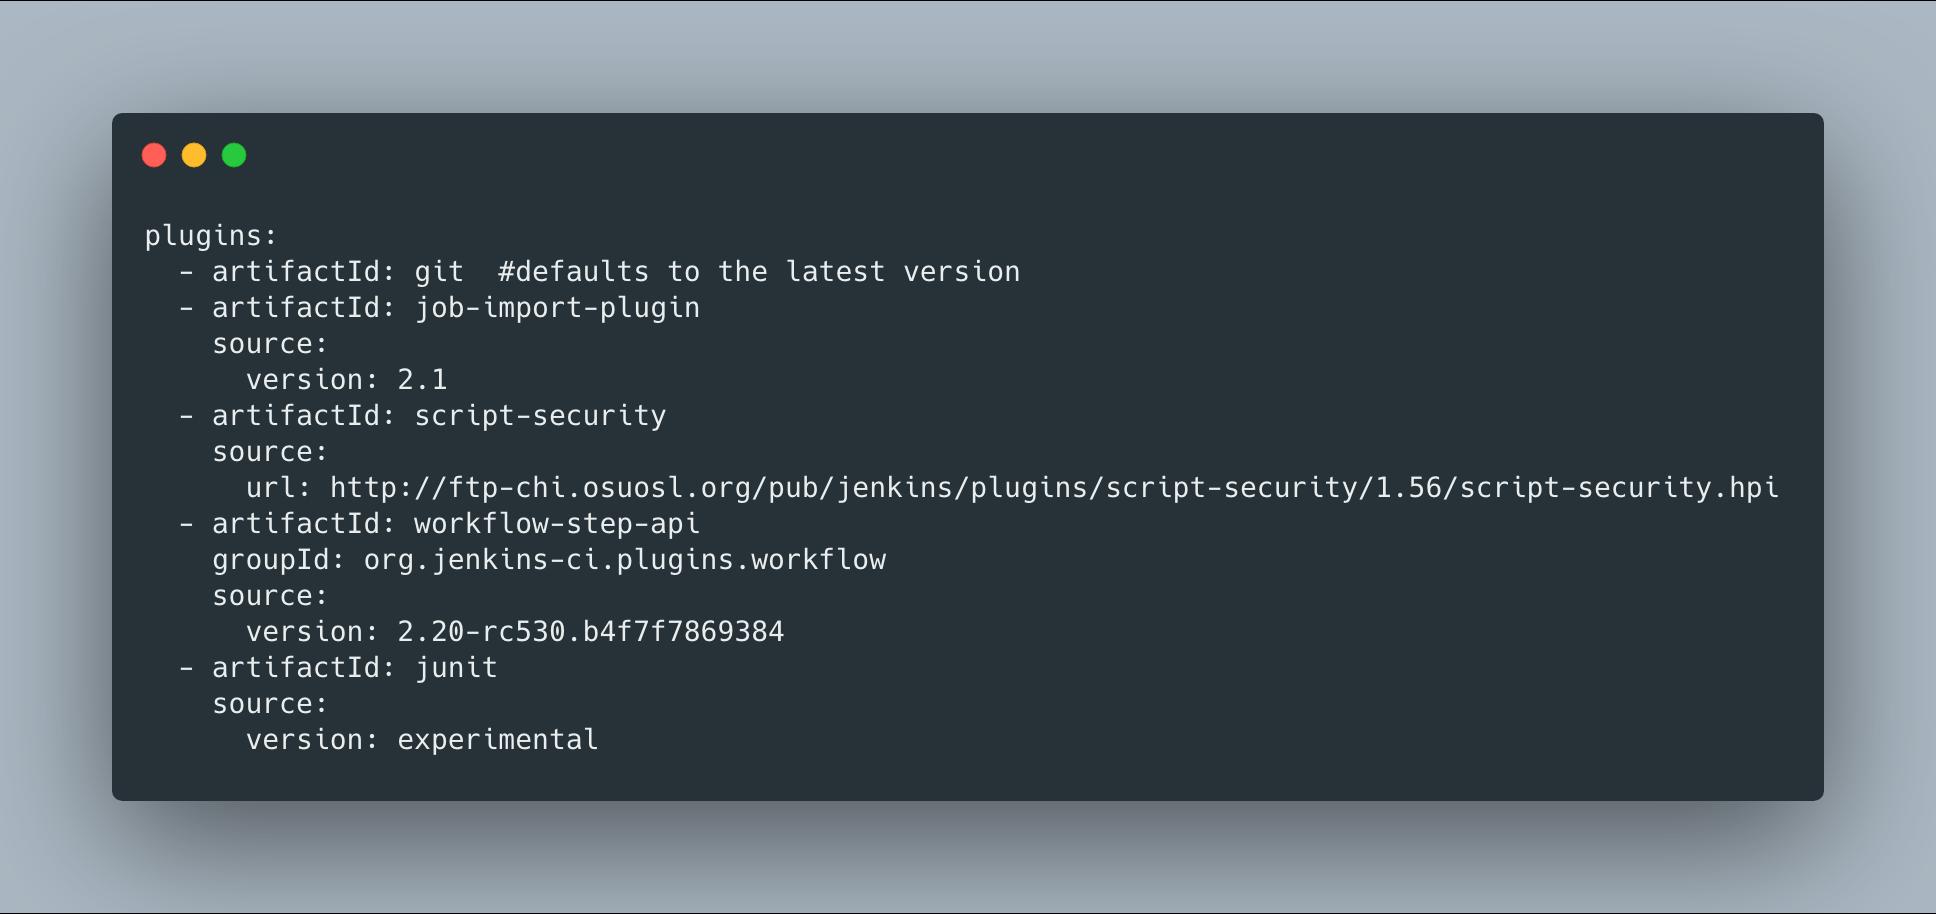 Plugin Manager Tool YAML file